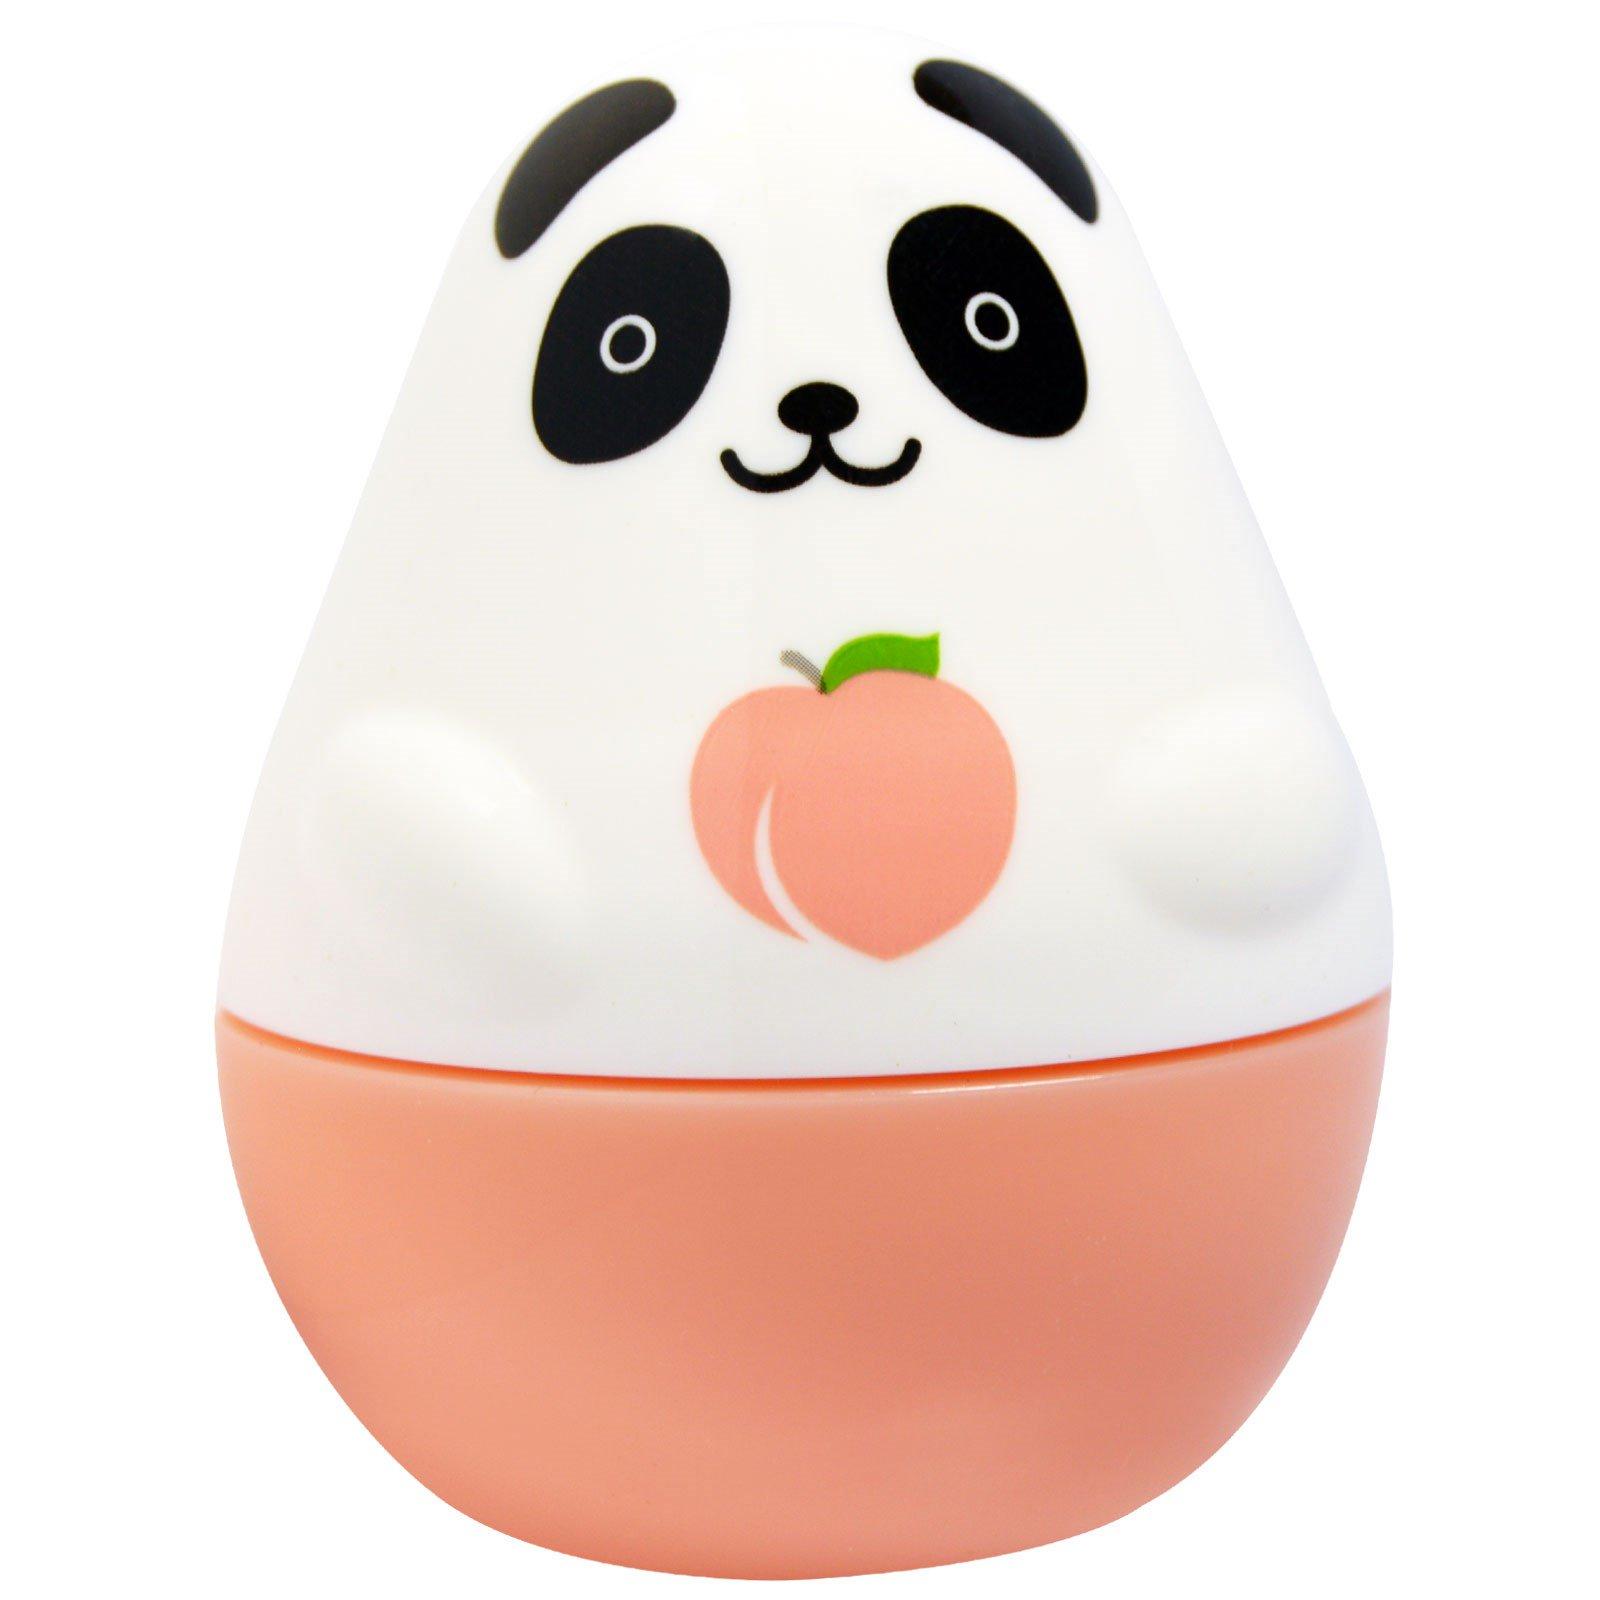 Superior Etude House, Missing U Hand Cream, #3 Panda, 1.01 Fl Oz (